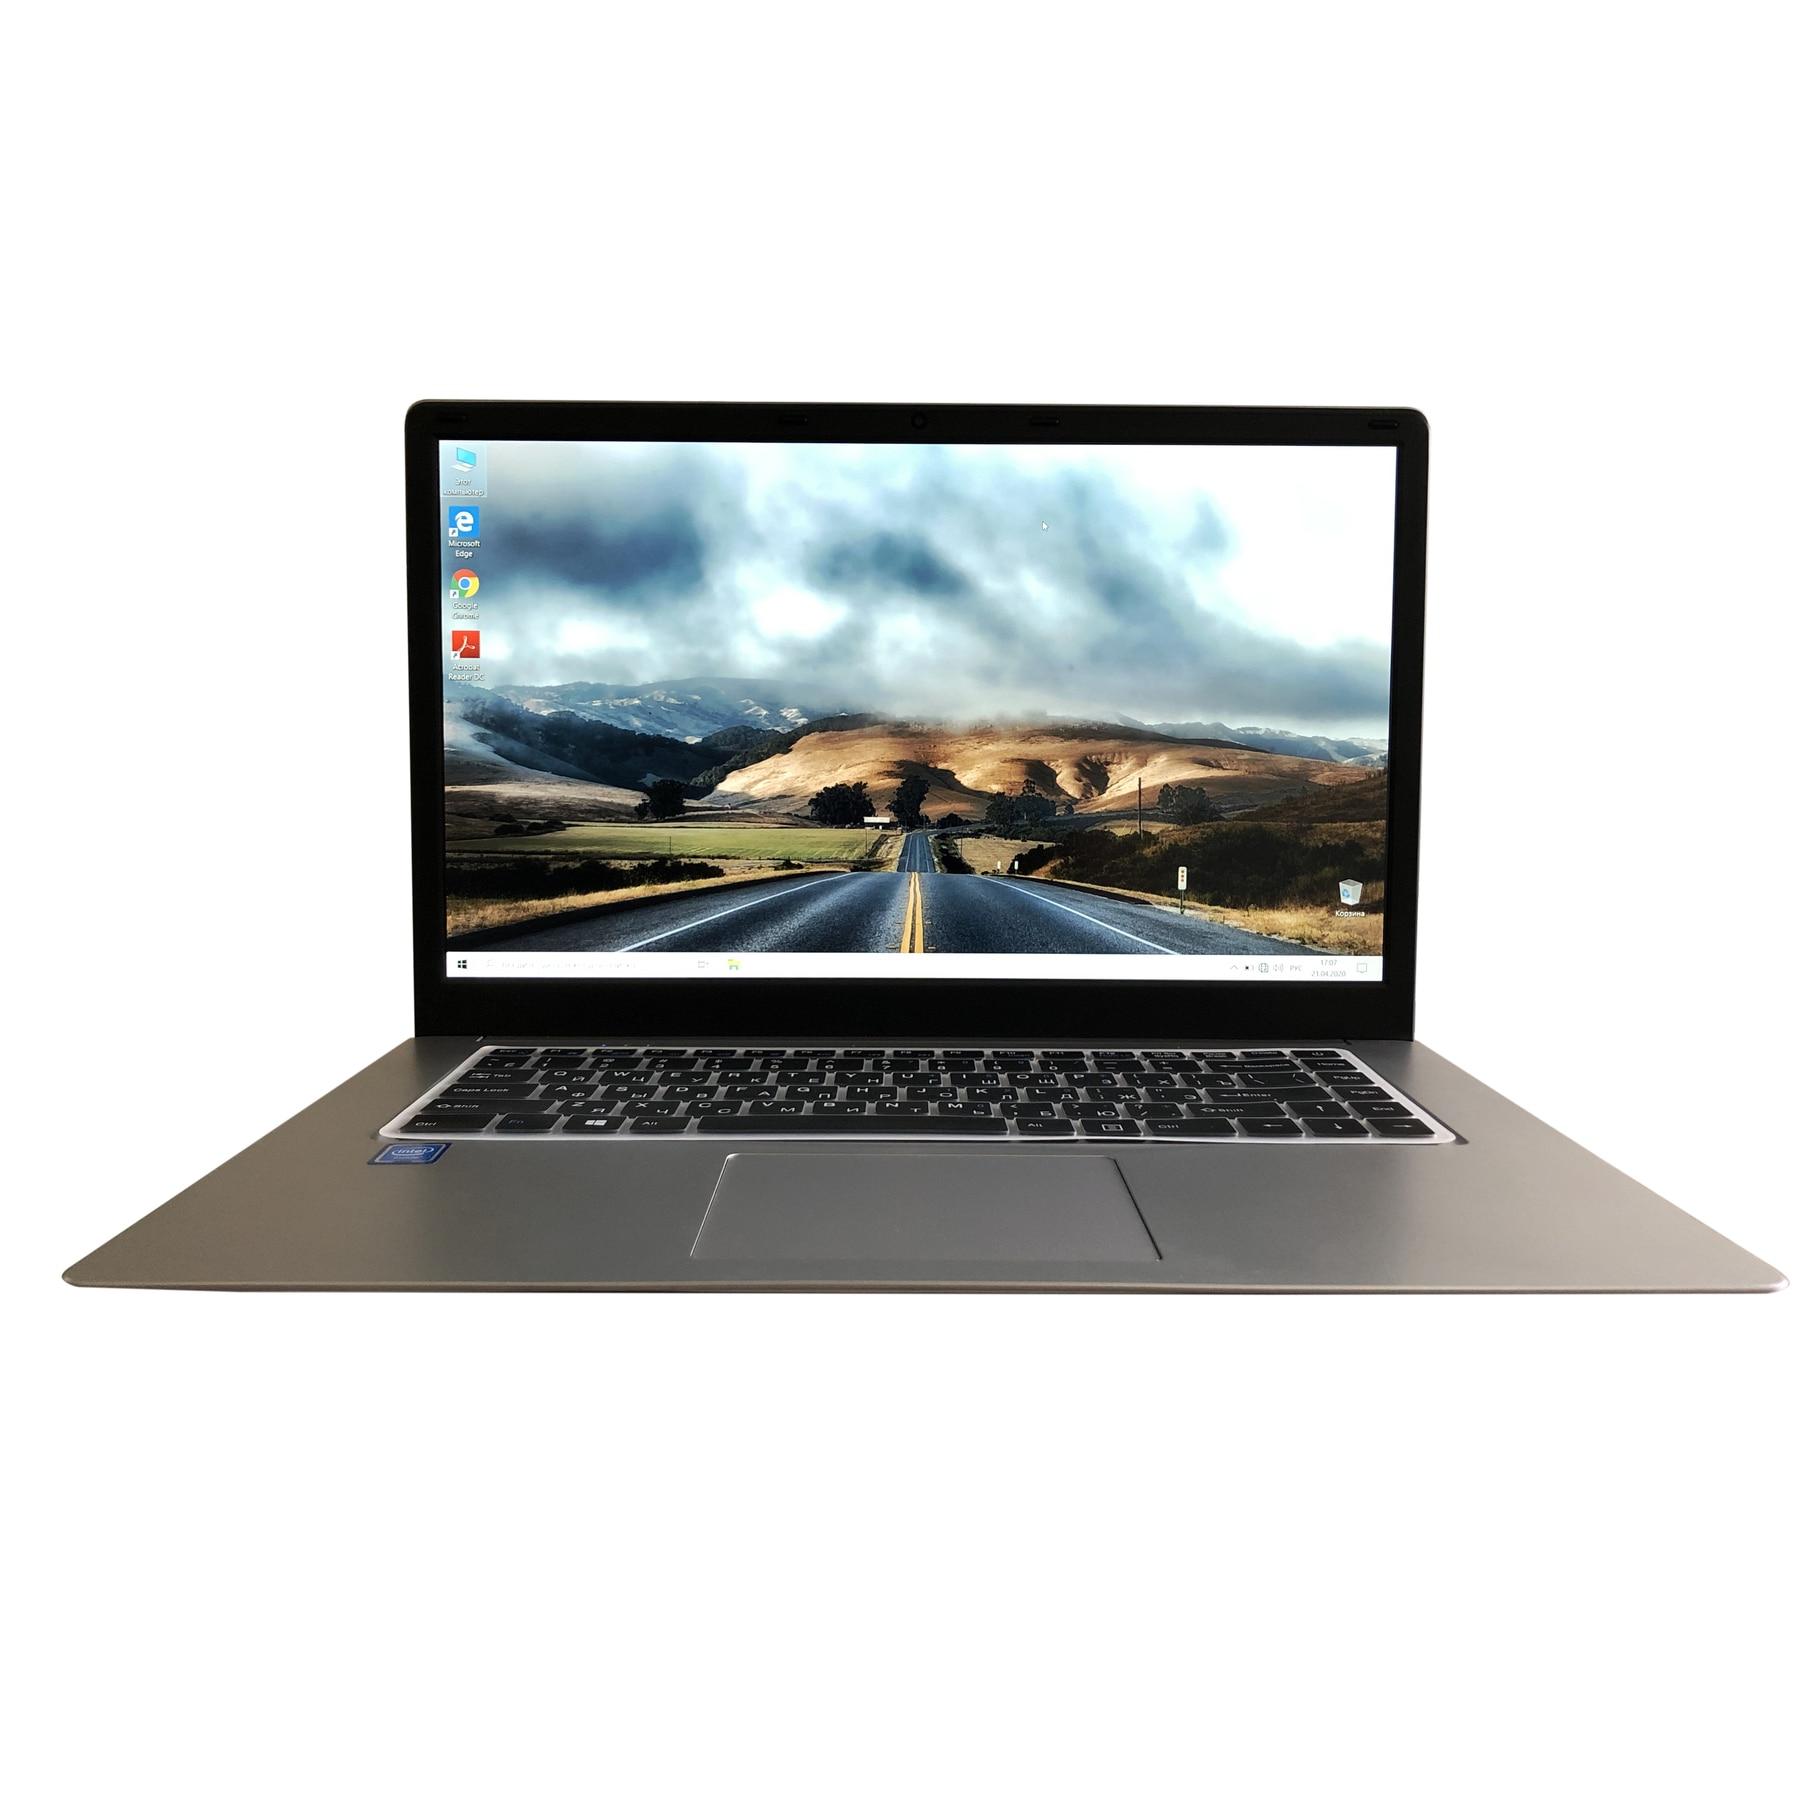 Ноутбук Echips Casual Slim 15.6